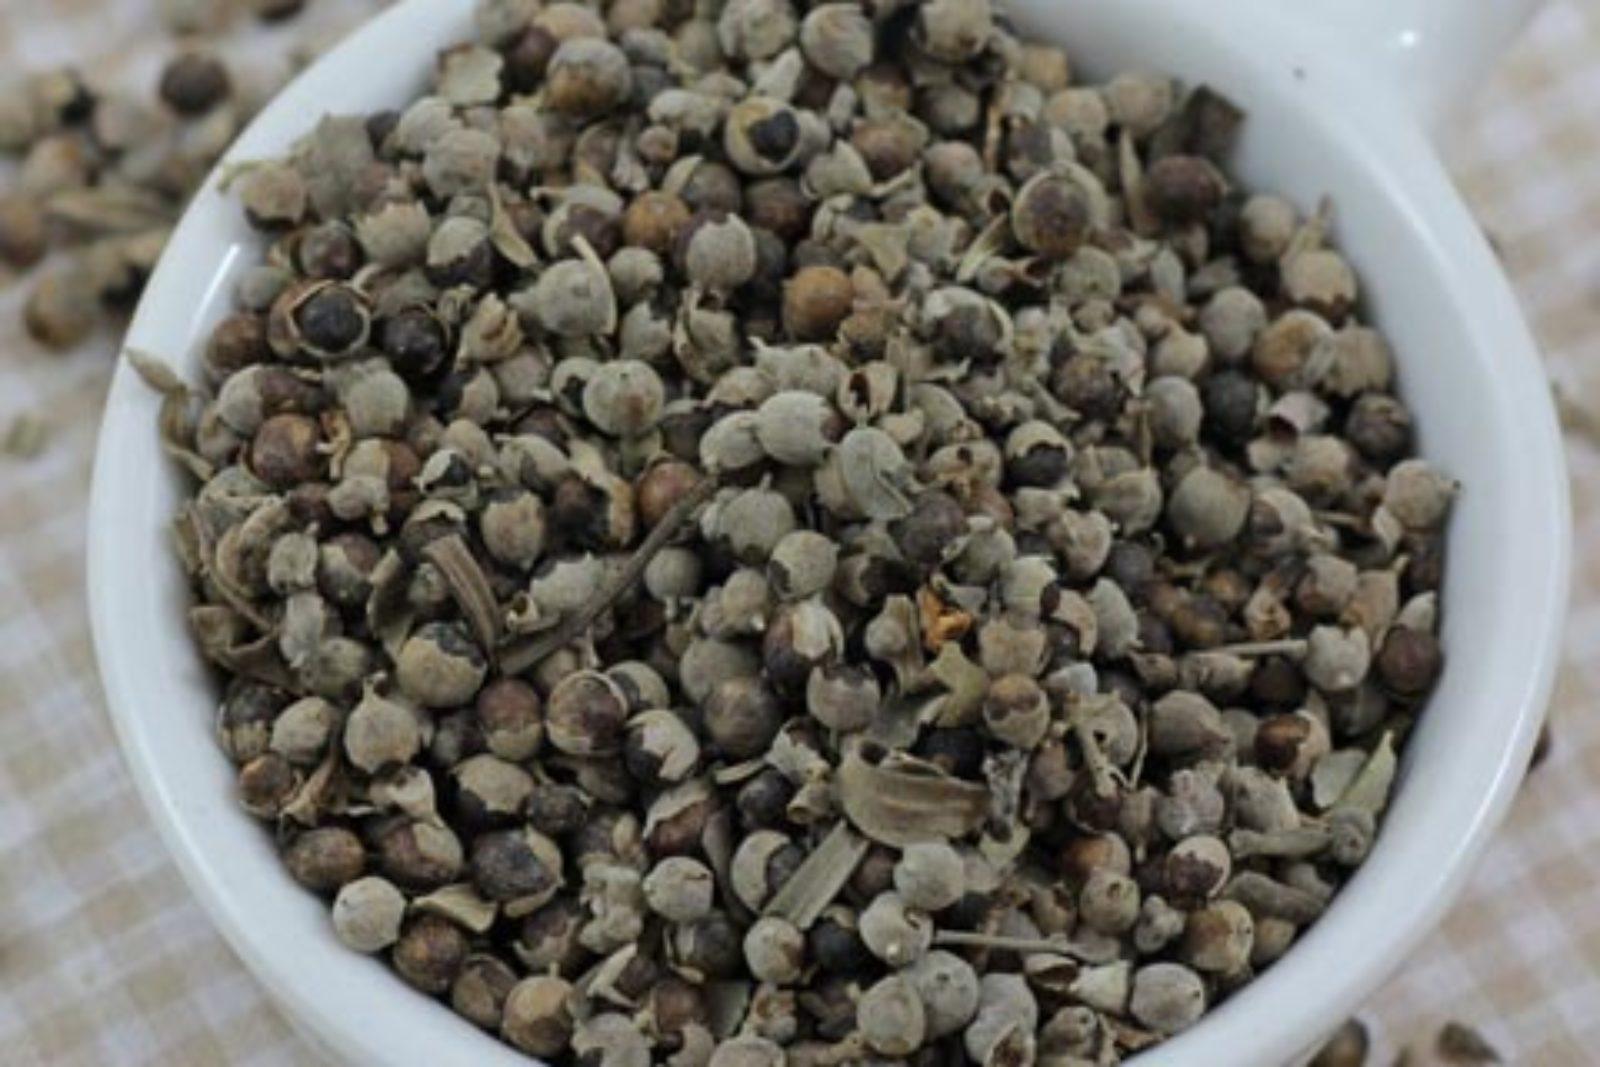 Monks Pepper seeds